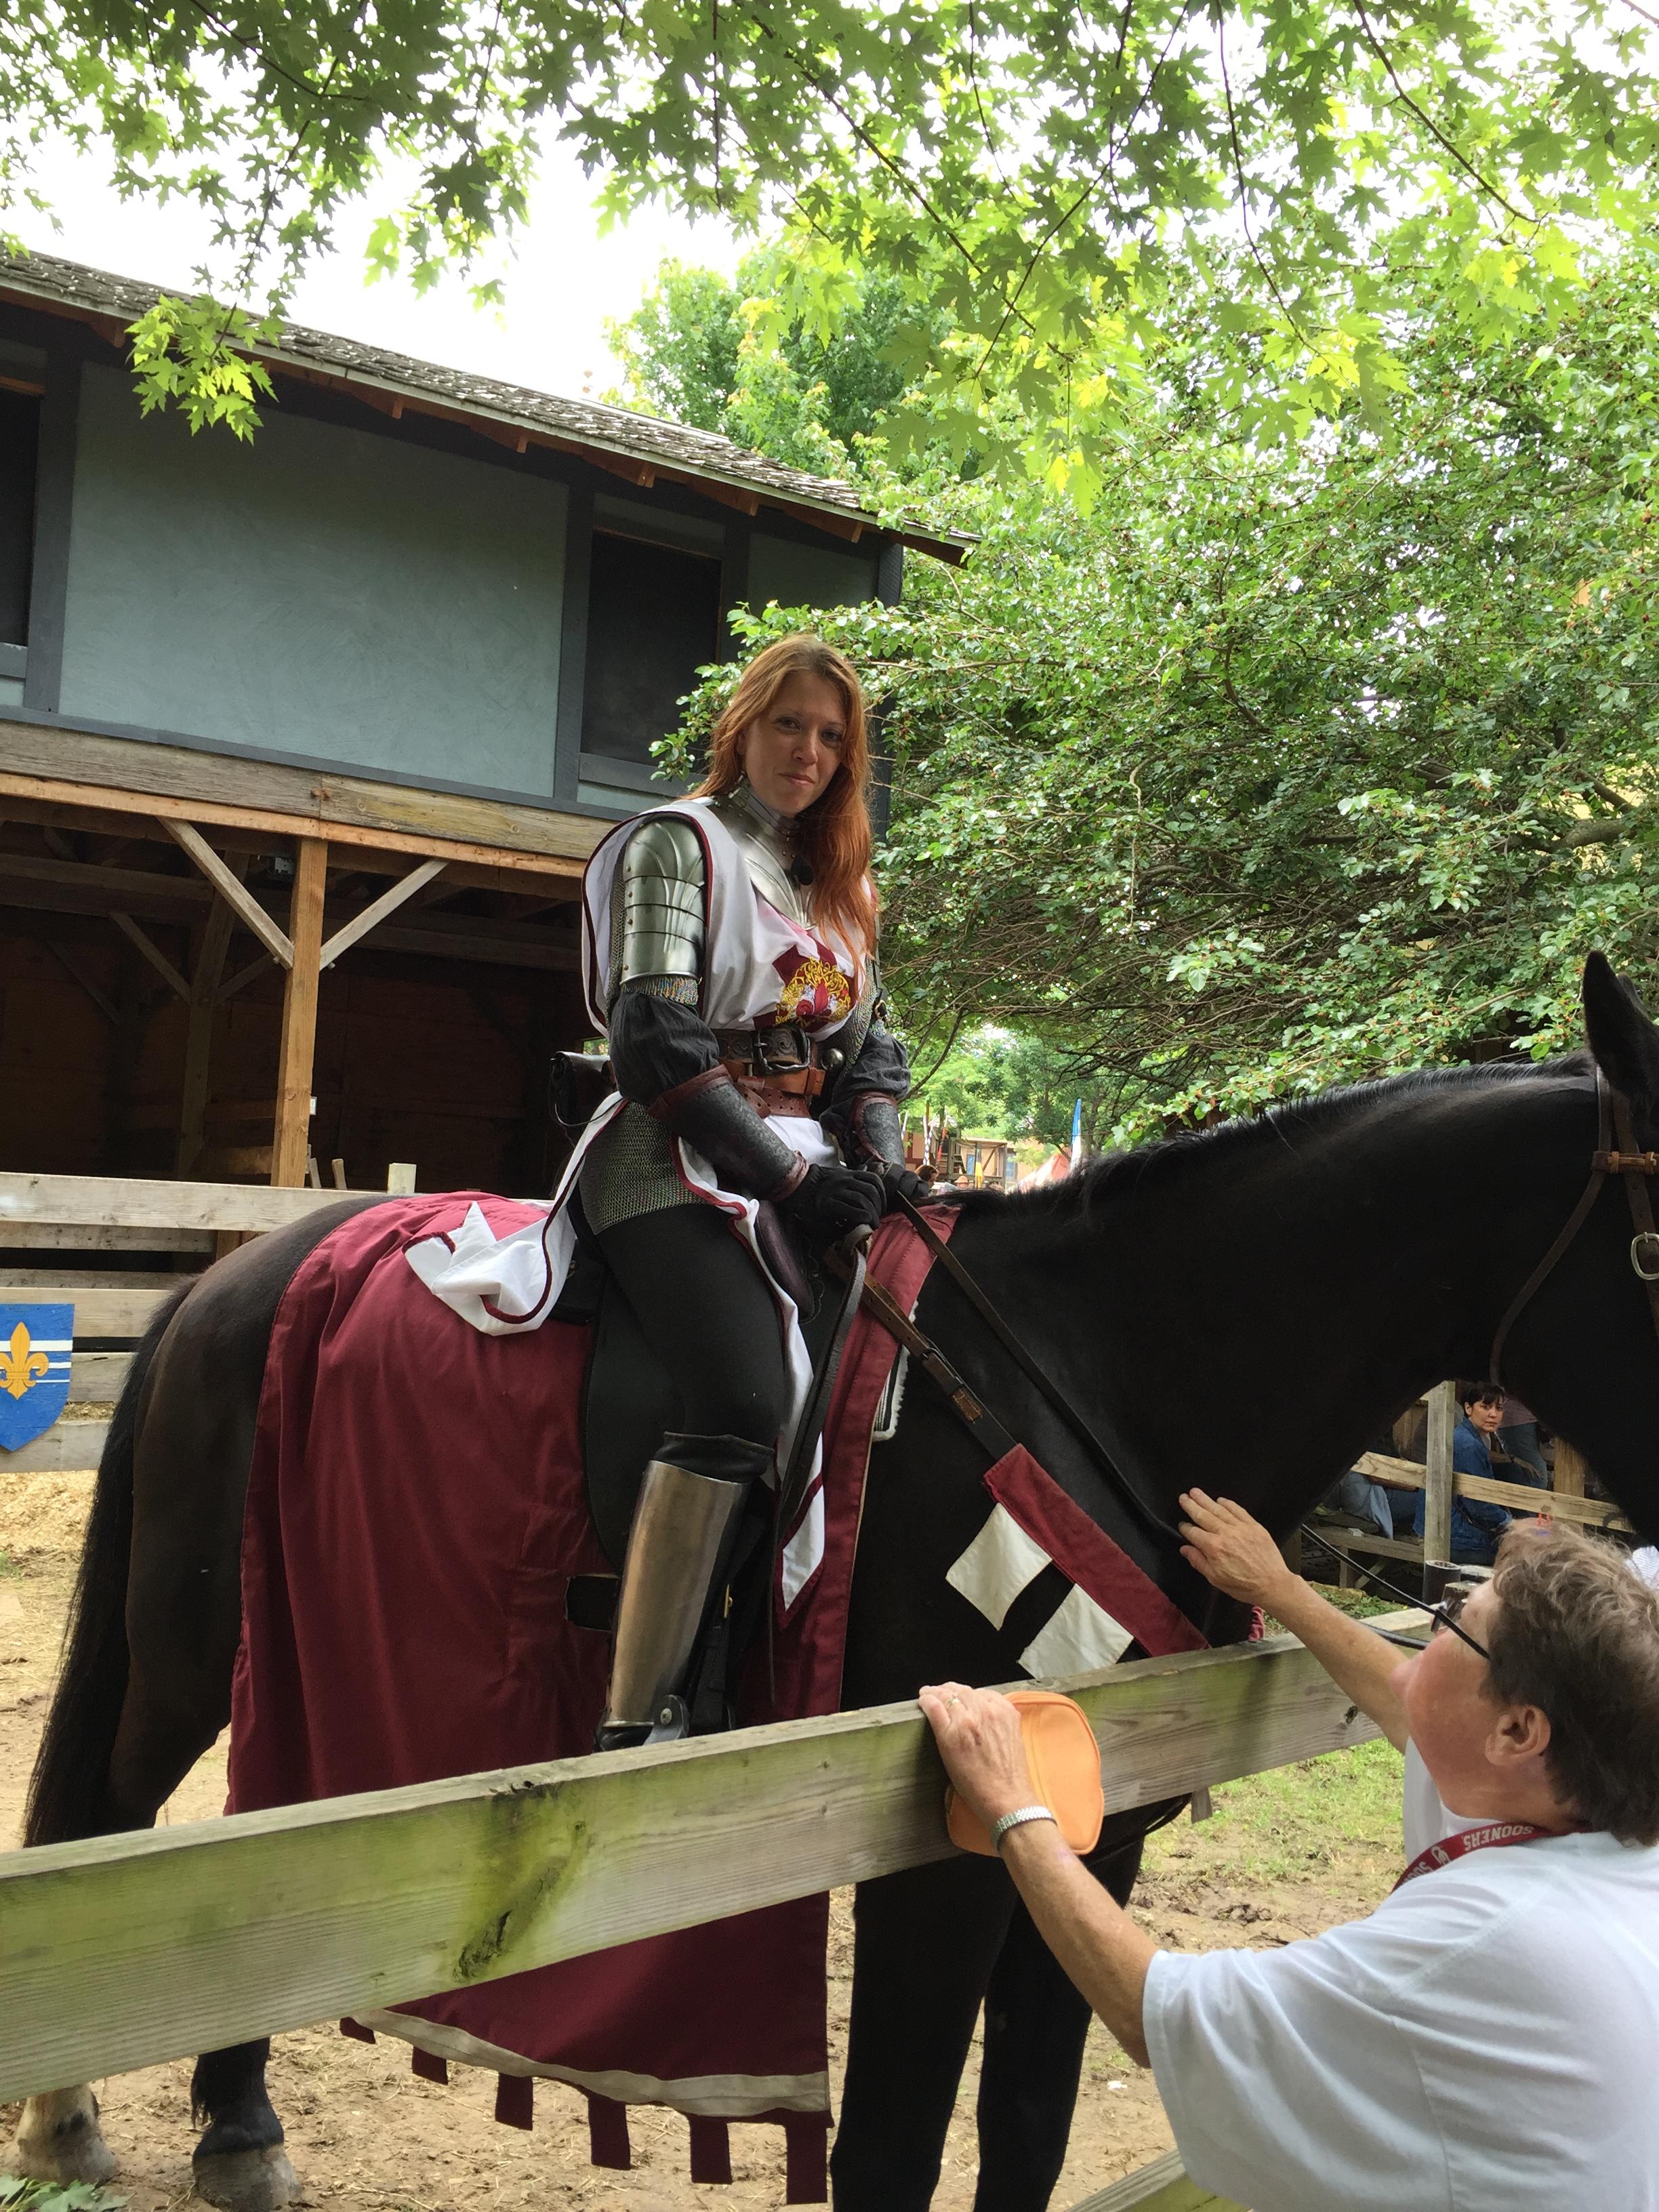 (Lady Knight on Horseback -- PHOTO COPYRIGHT 2015 BY JAZ PRIMO)